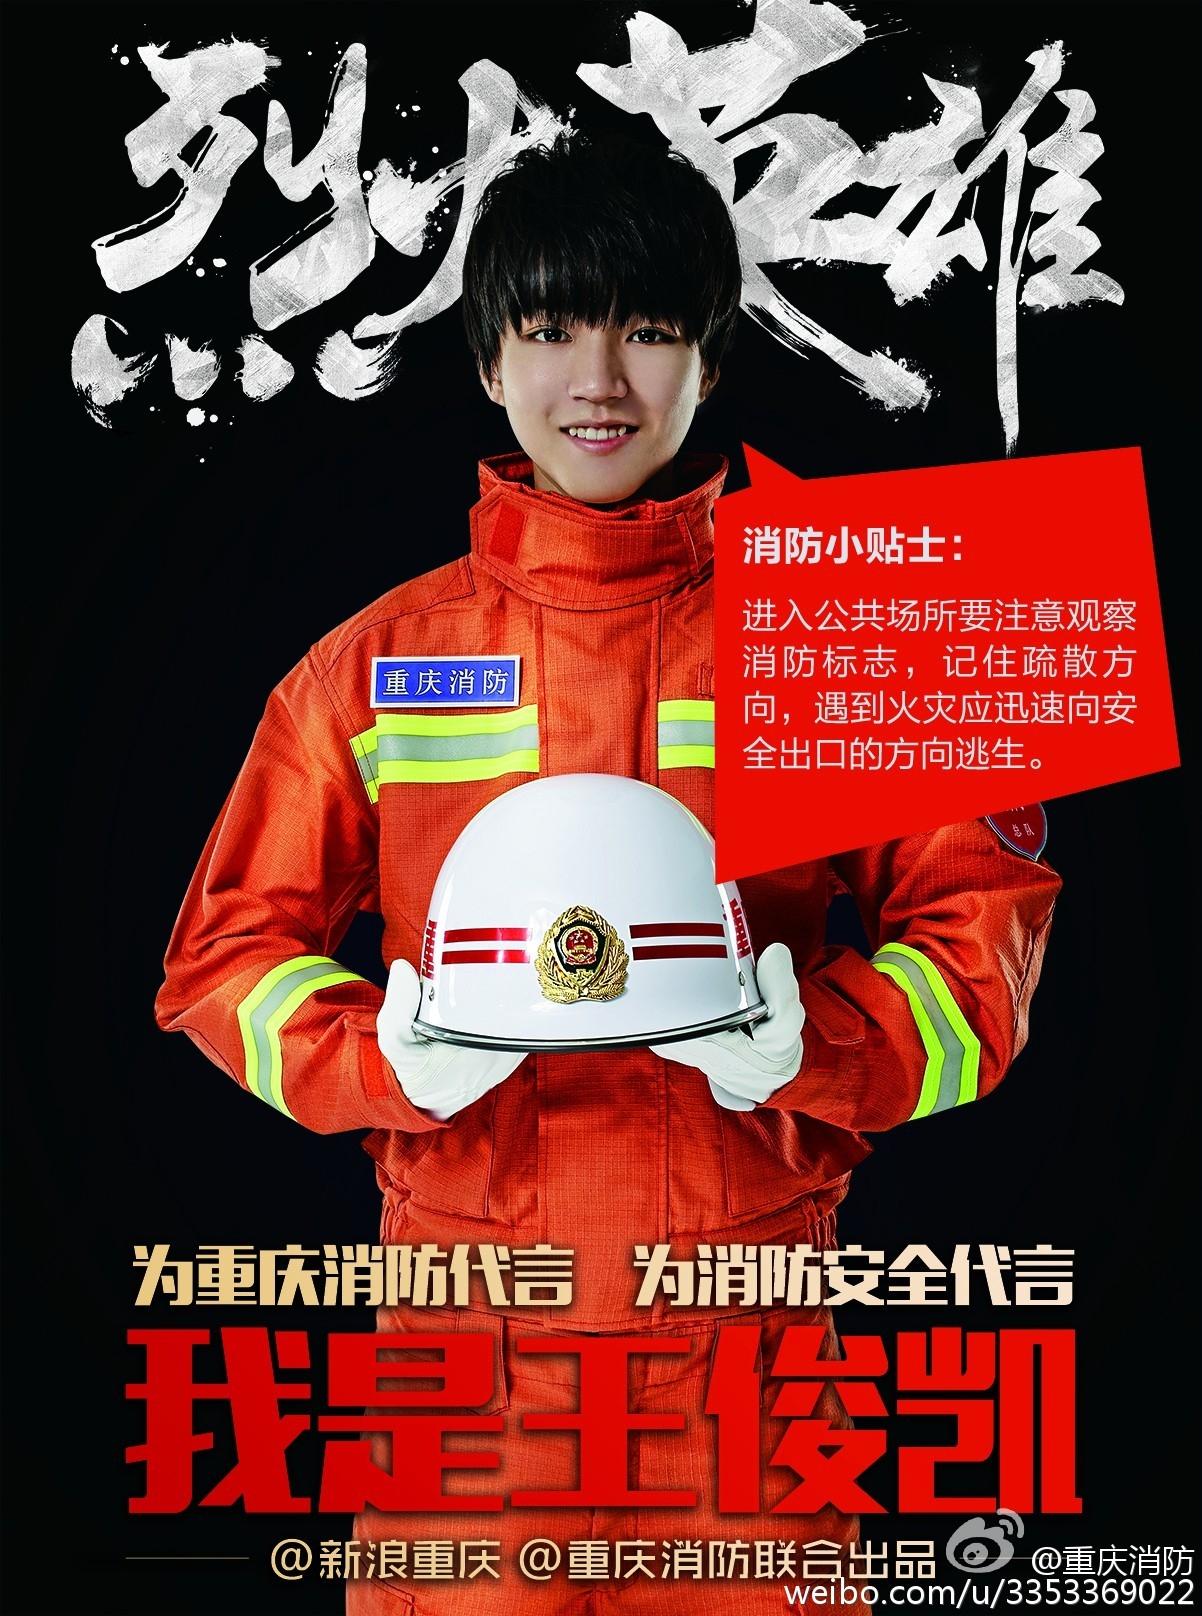 [tfboys][分享]151105 重庆消防发王俊凯个人海报 一